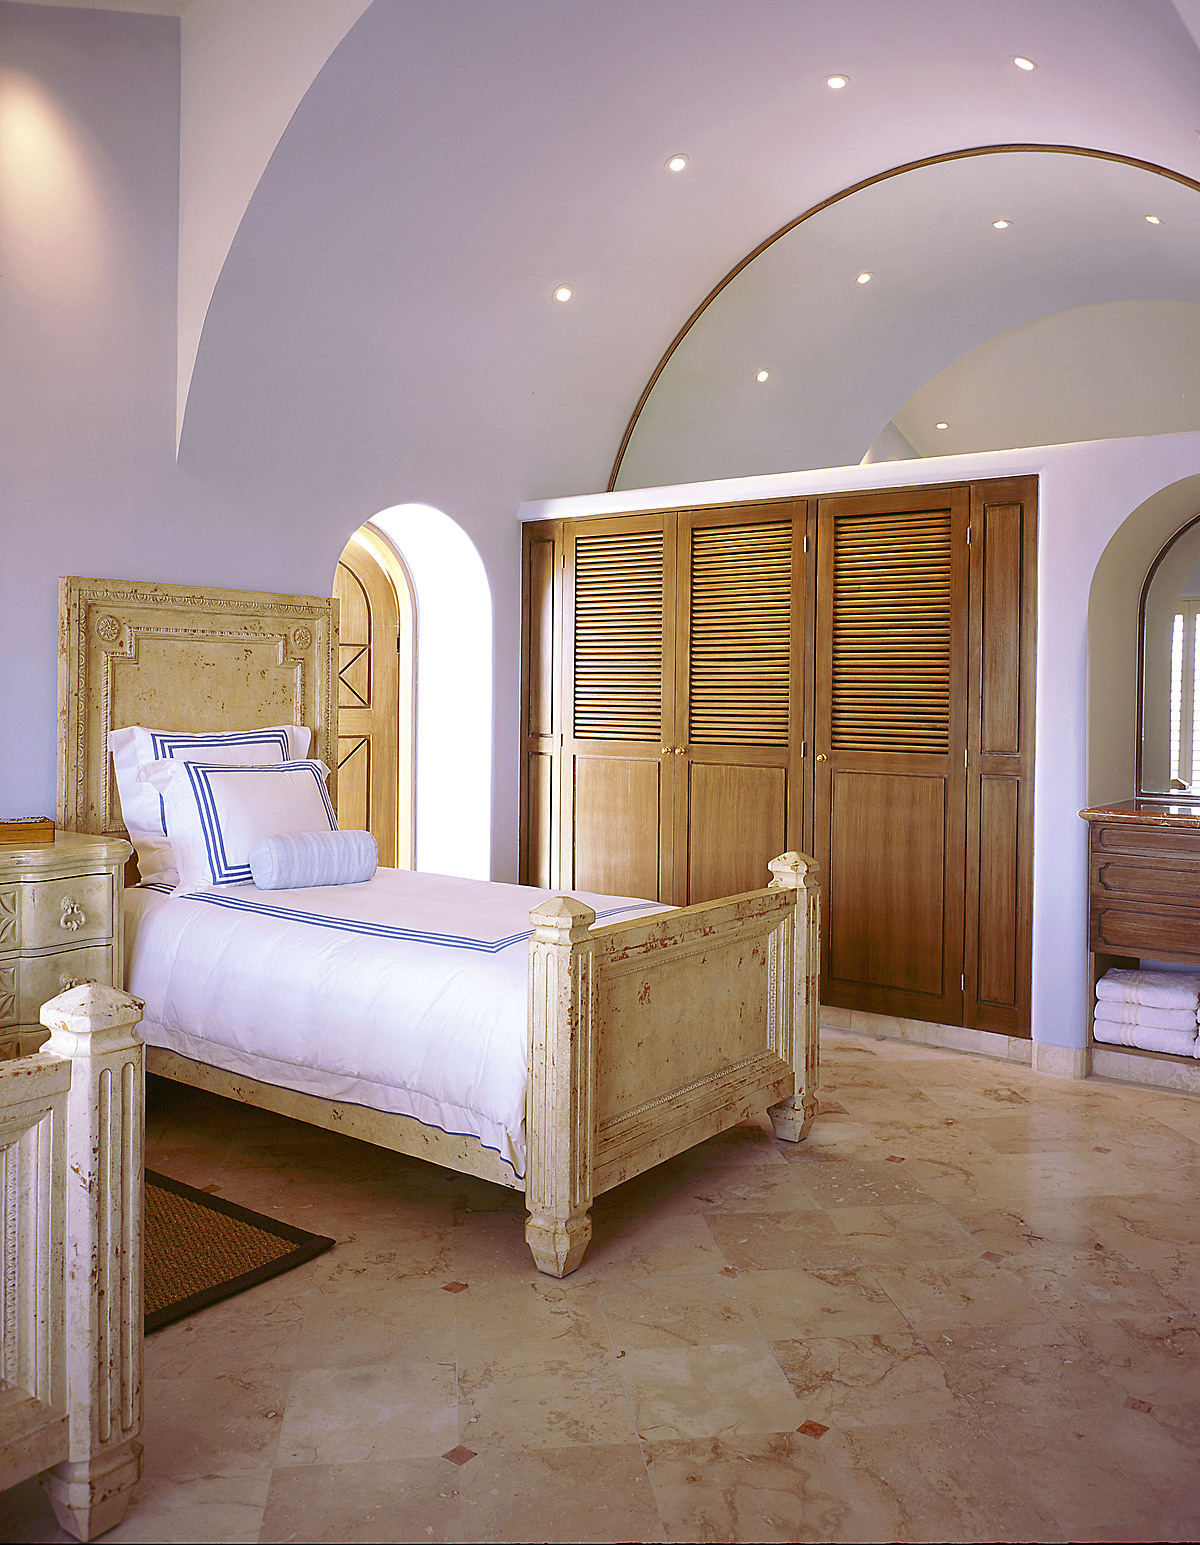 Townhouse bedroom.